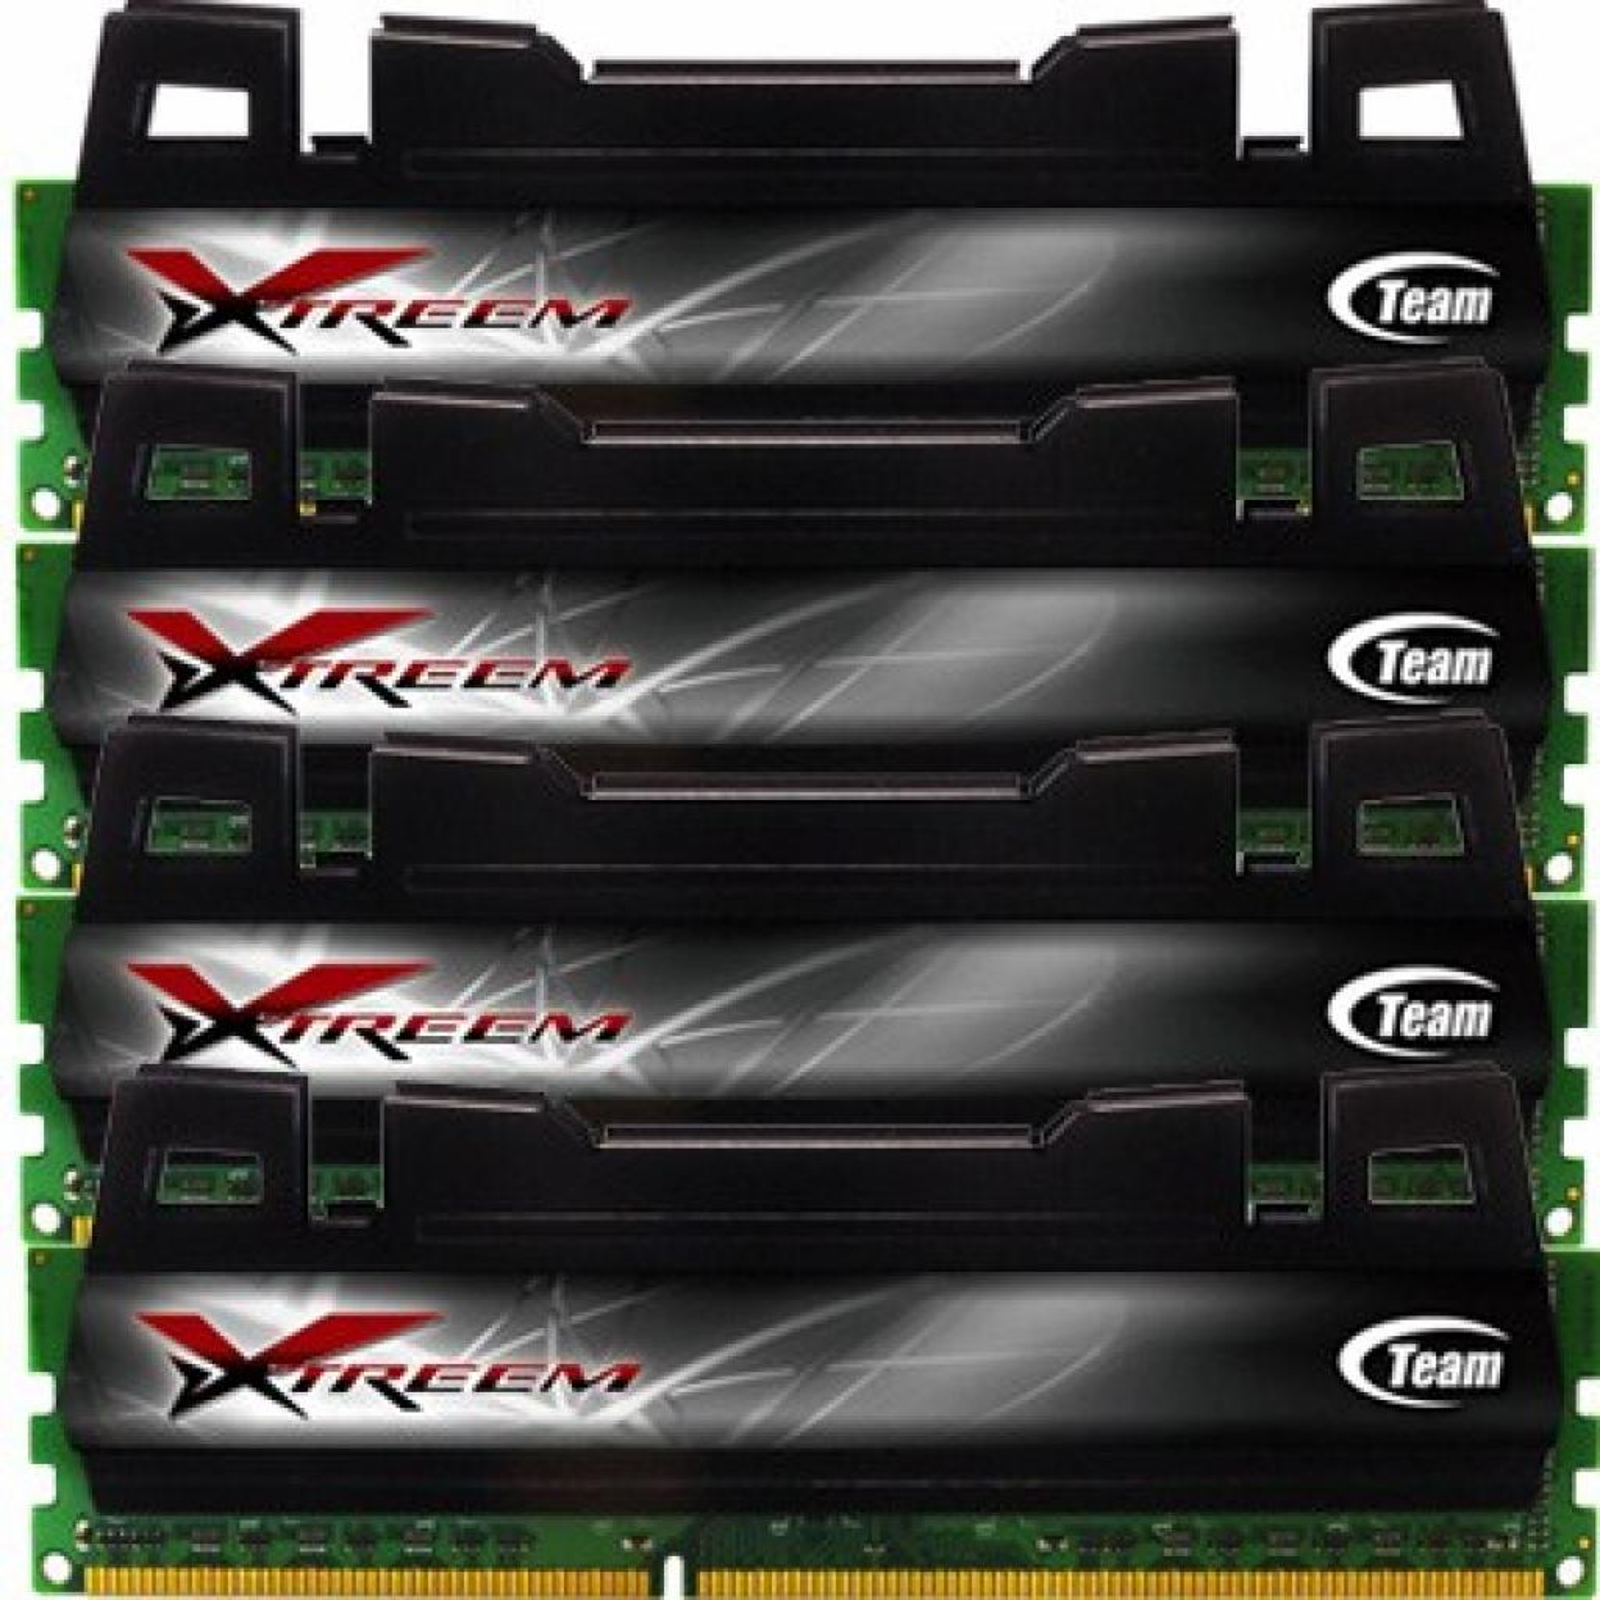 Модуль памяти для компьютера DDR3 16GB (4x4GB) 1600 MHz Team (TDD316G1600HC9QC01)